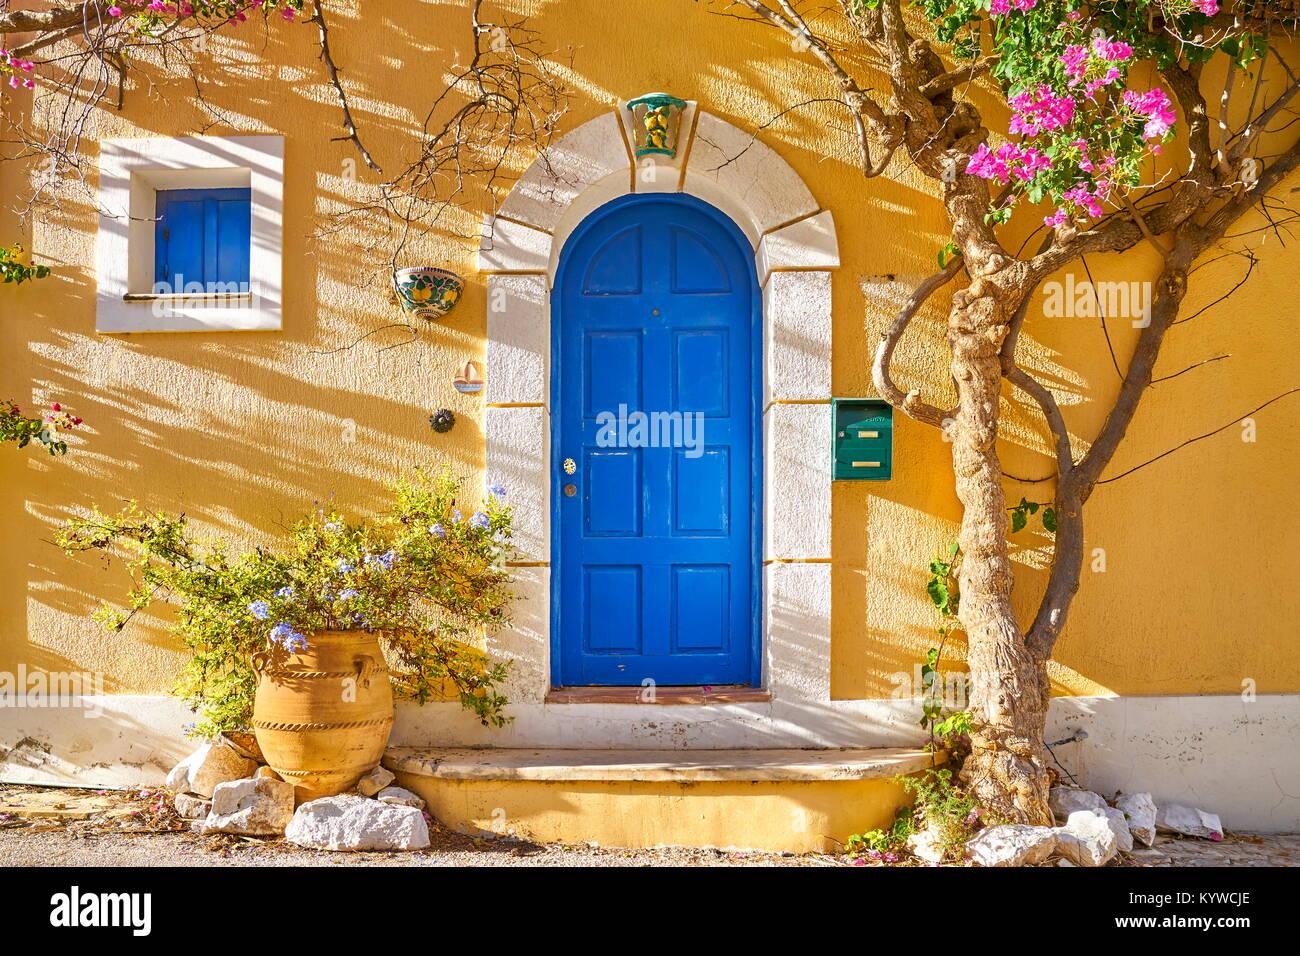 Traditional greek house in Assos village, Kefalonia Island, Greece - Stock Image